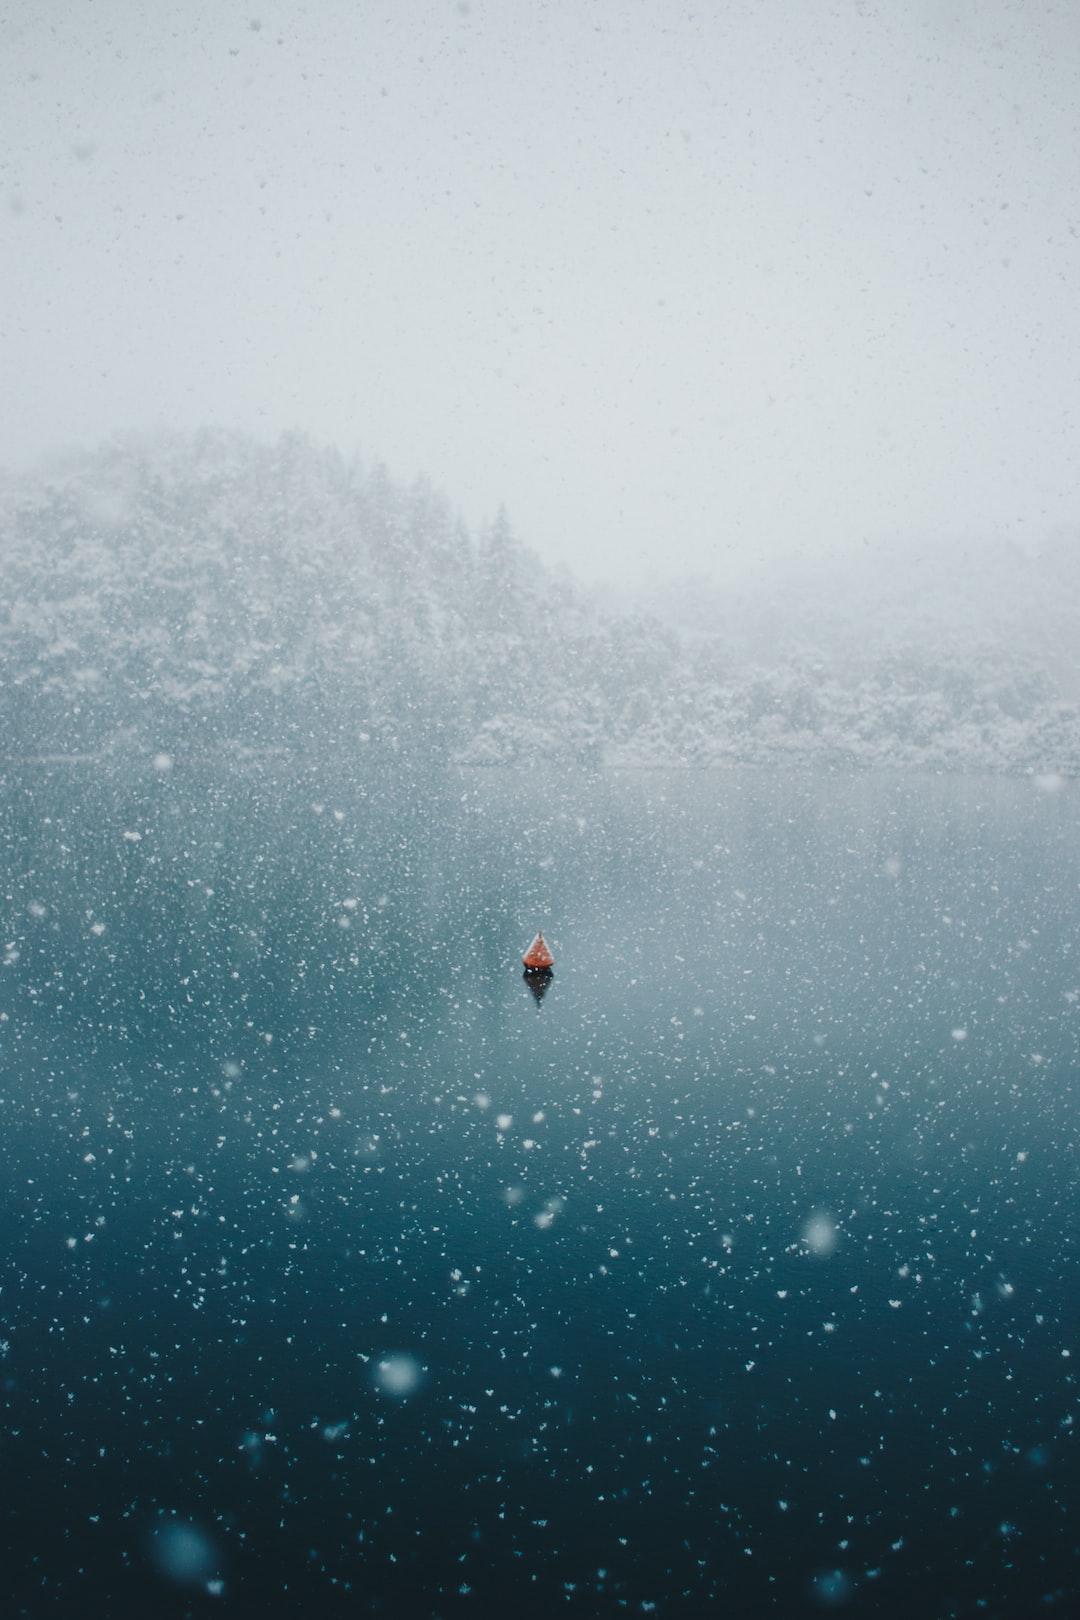 Patagonian lake buoy photo by guille pozzi (@guillepozzi ...